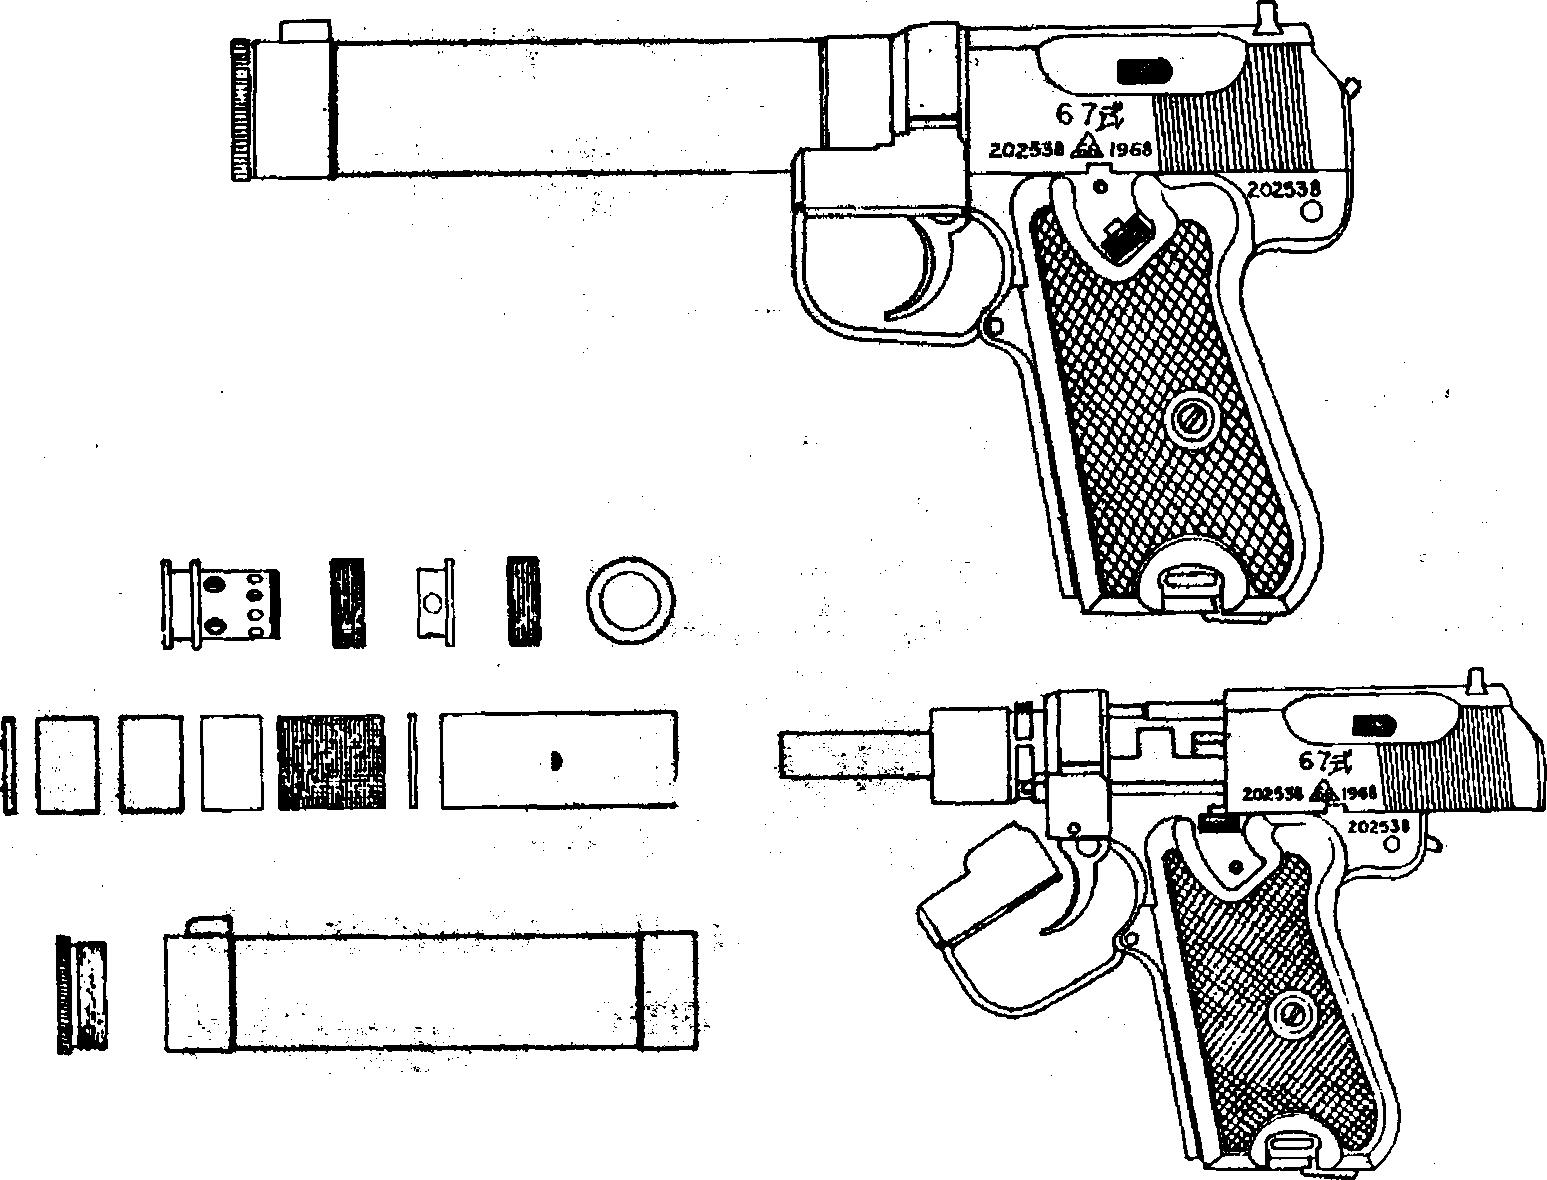 sights - homeamde silencers